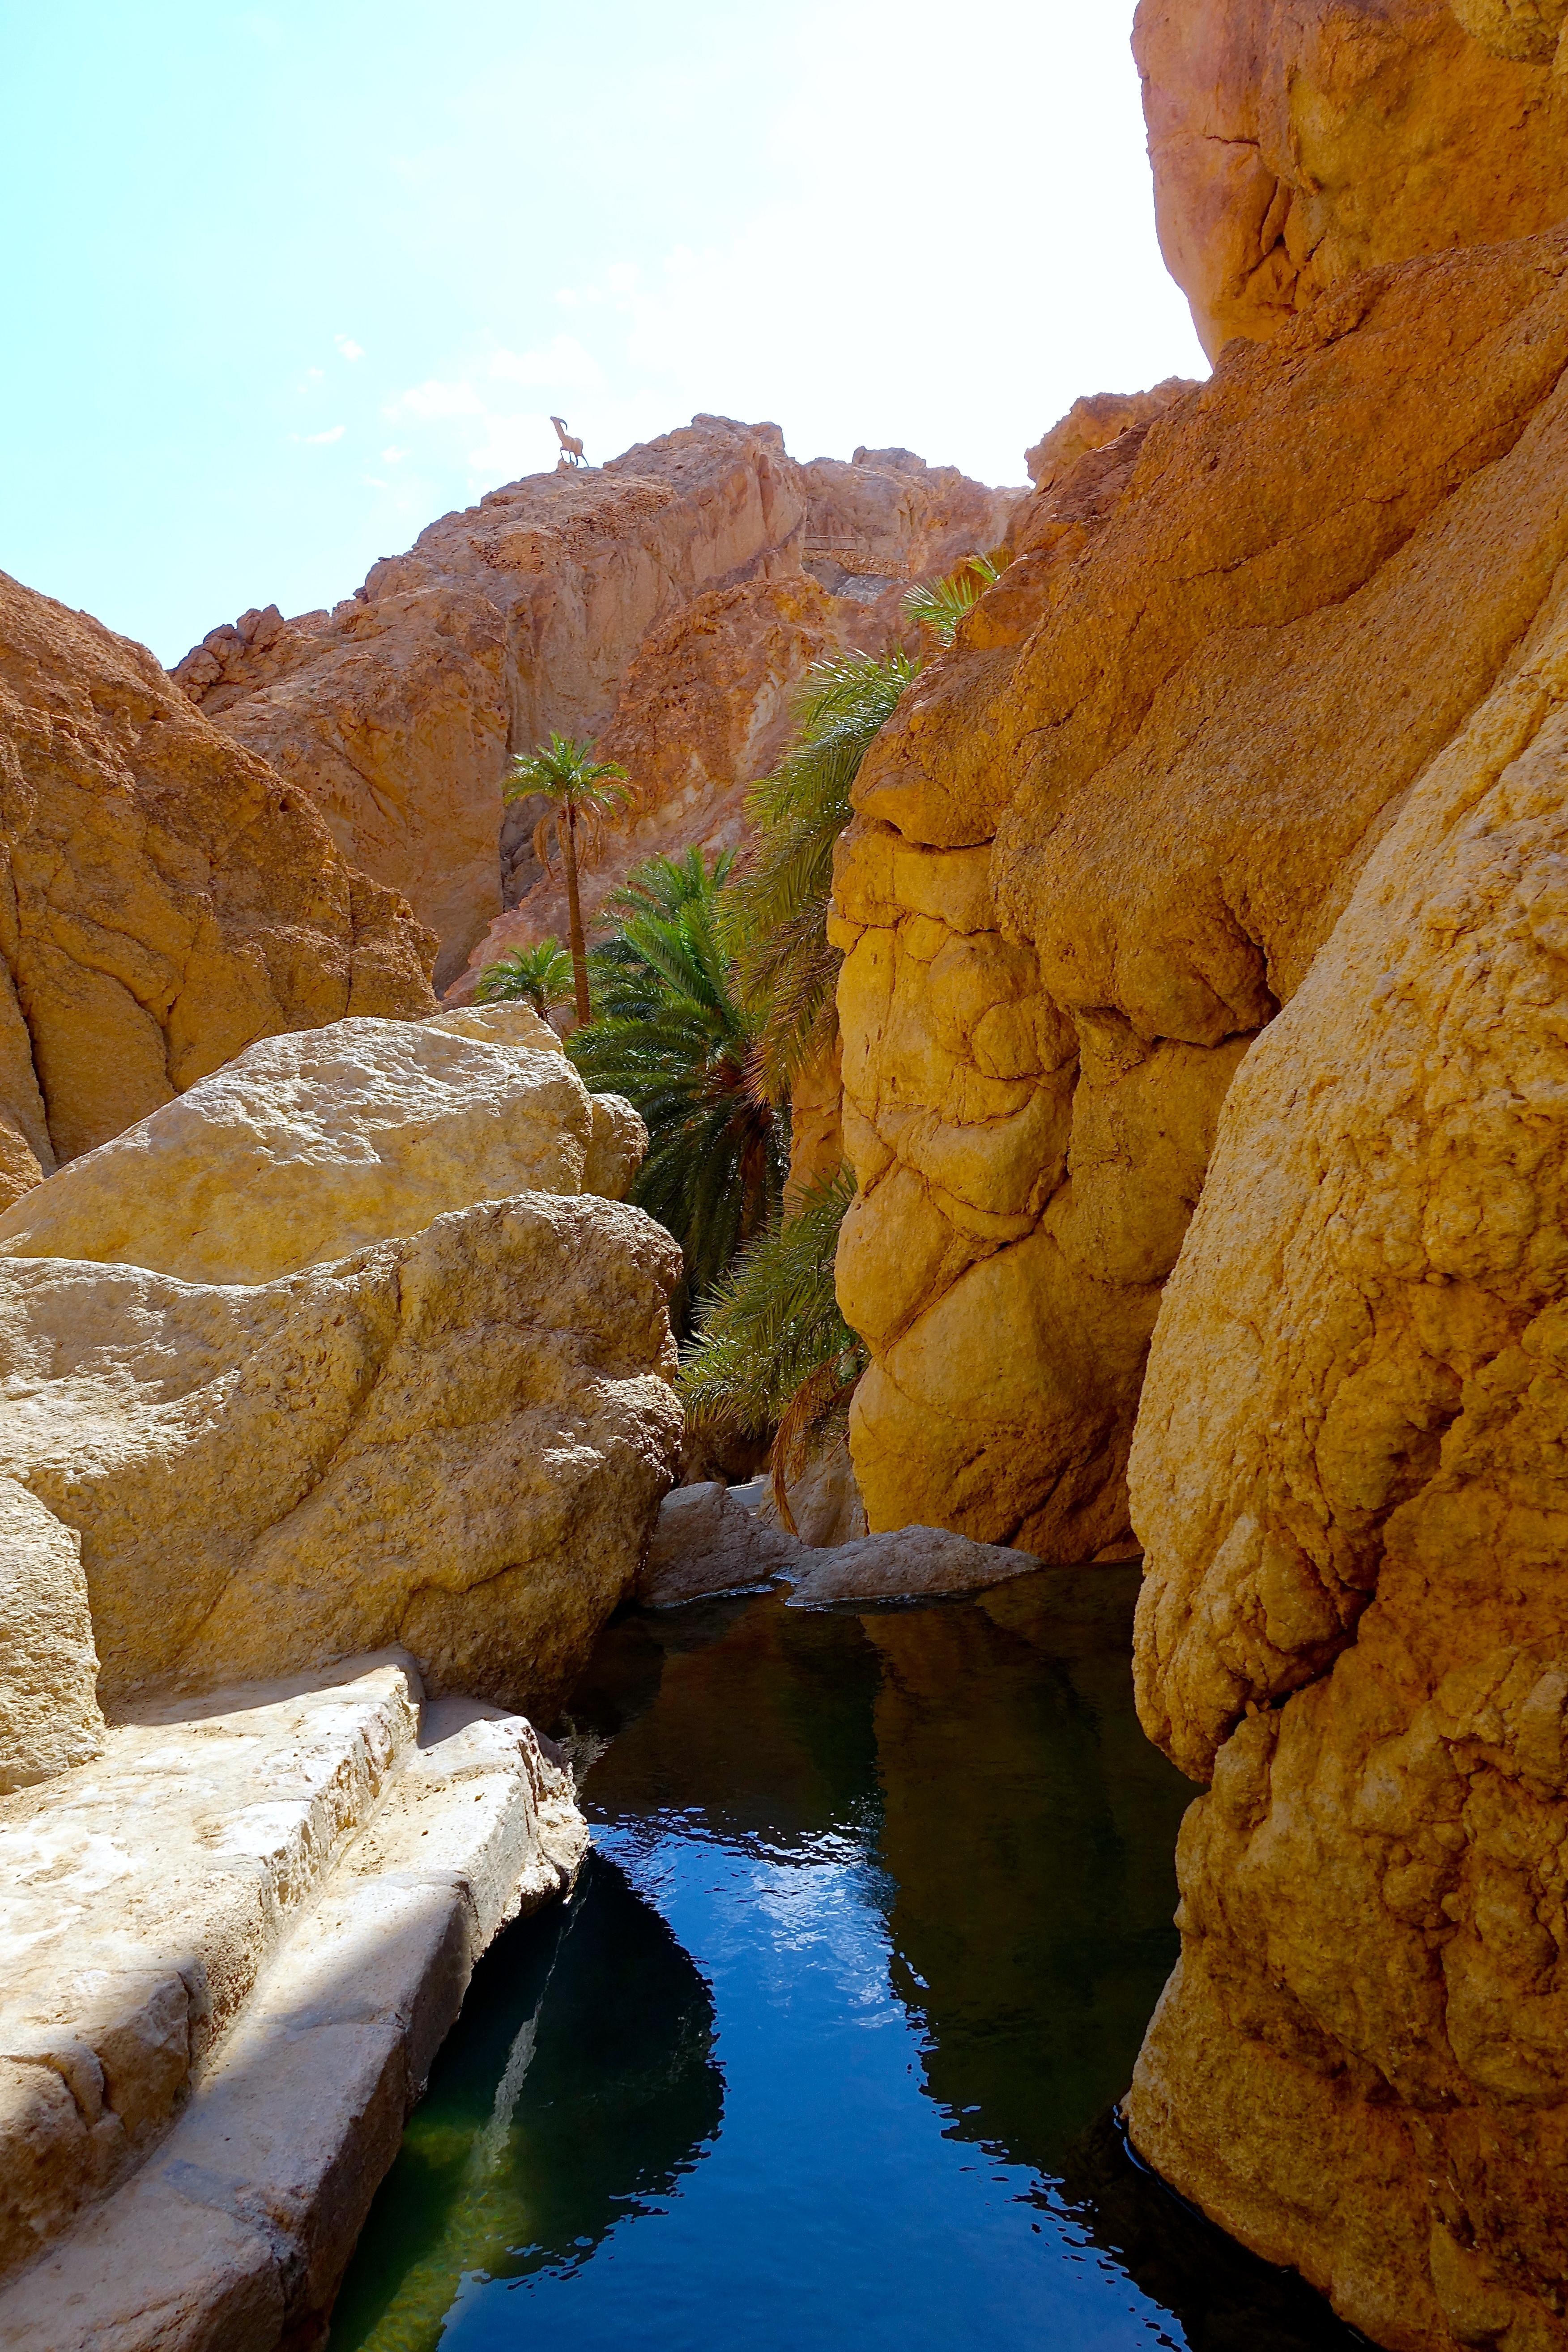 Streams In The Dessert  Streams in the desert Tunisian wilderness finding a